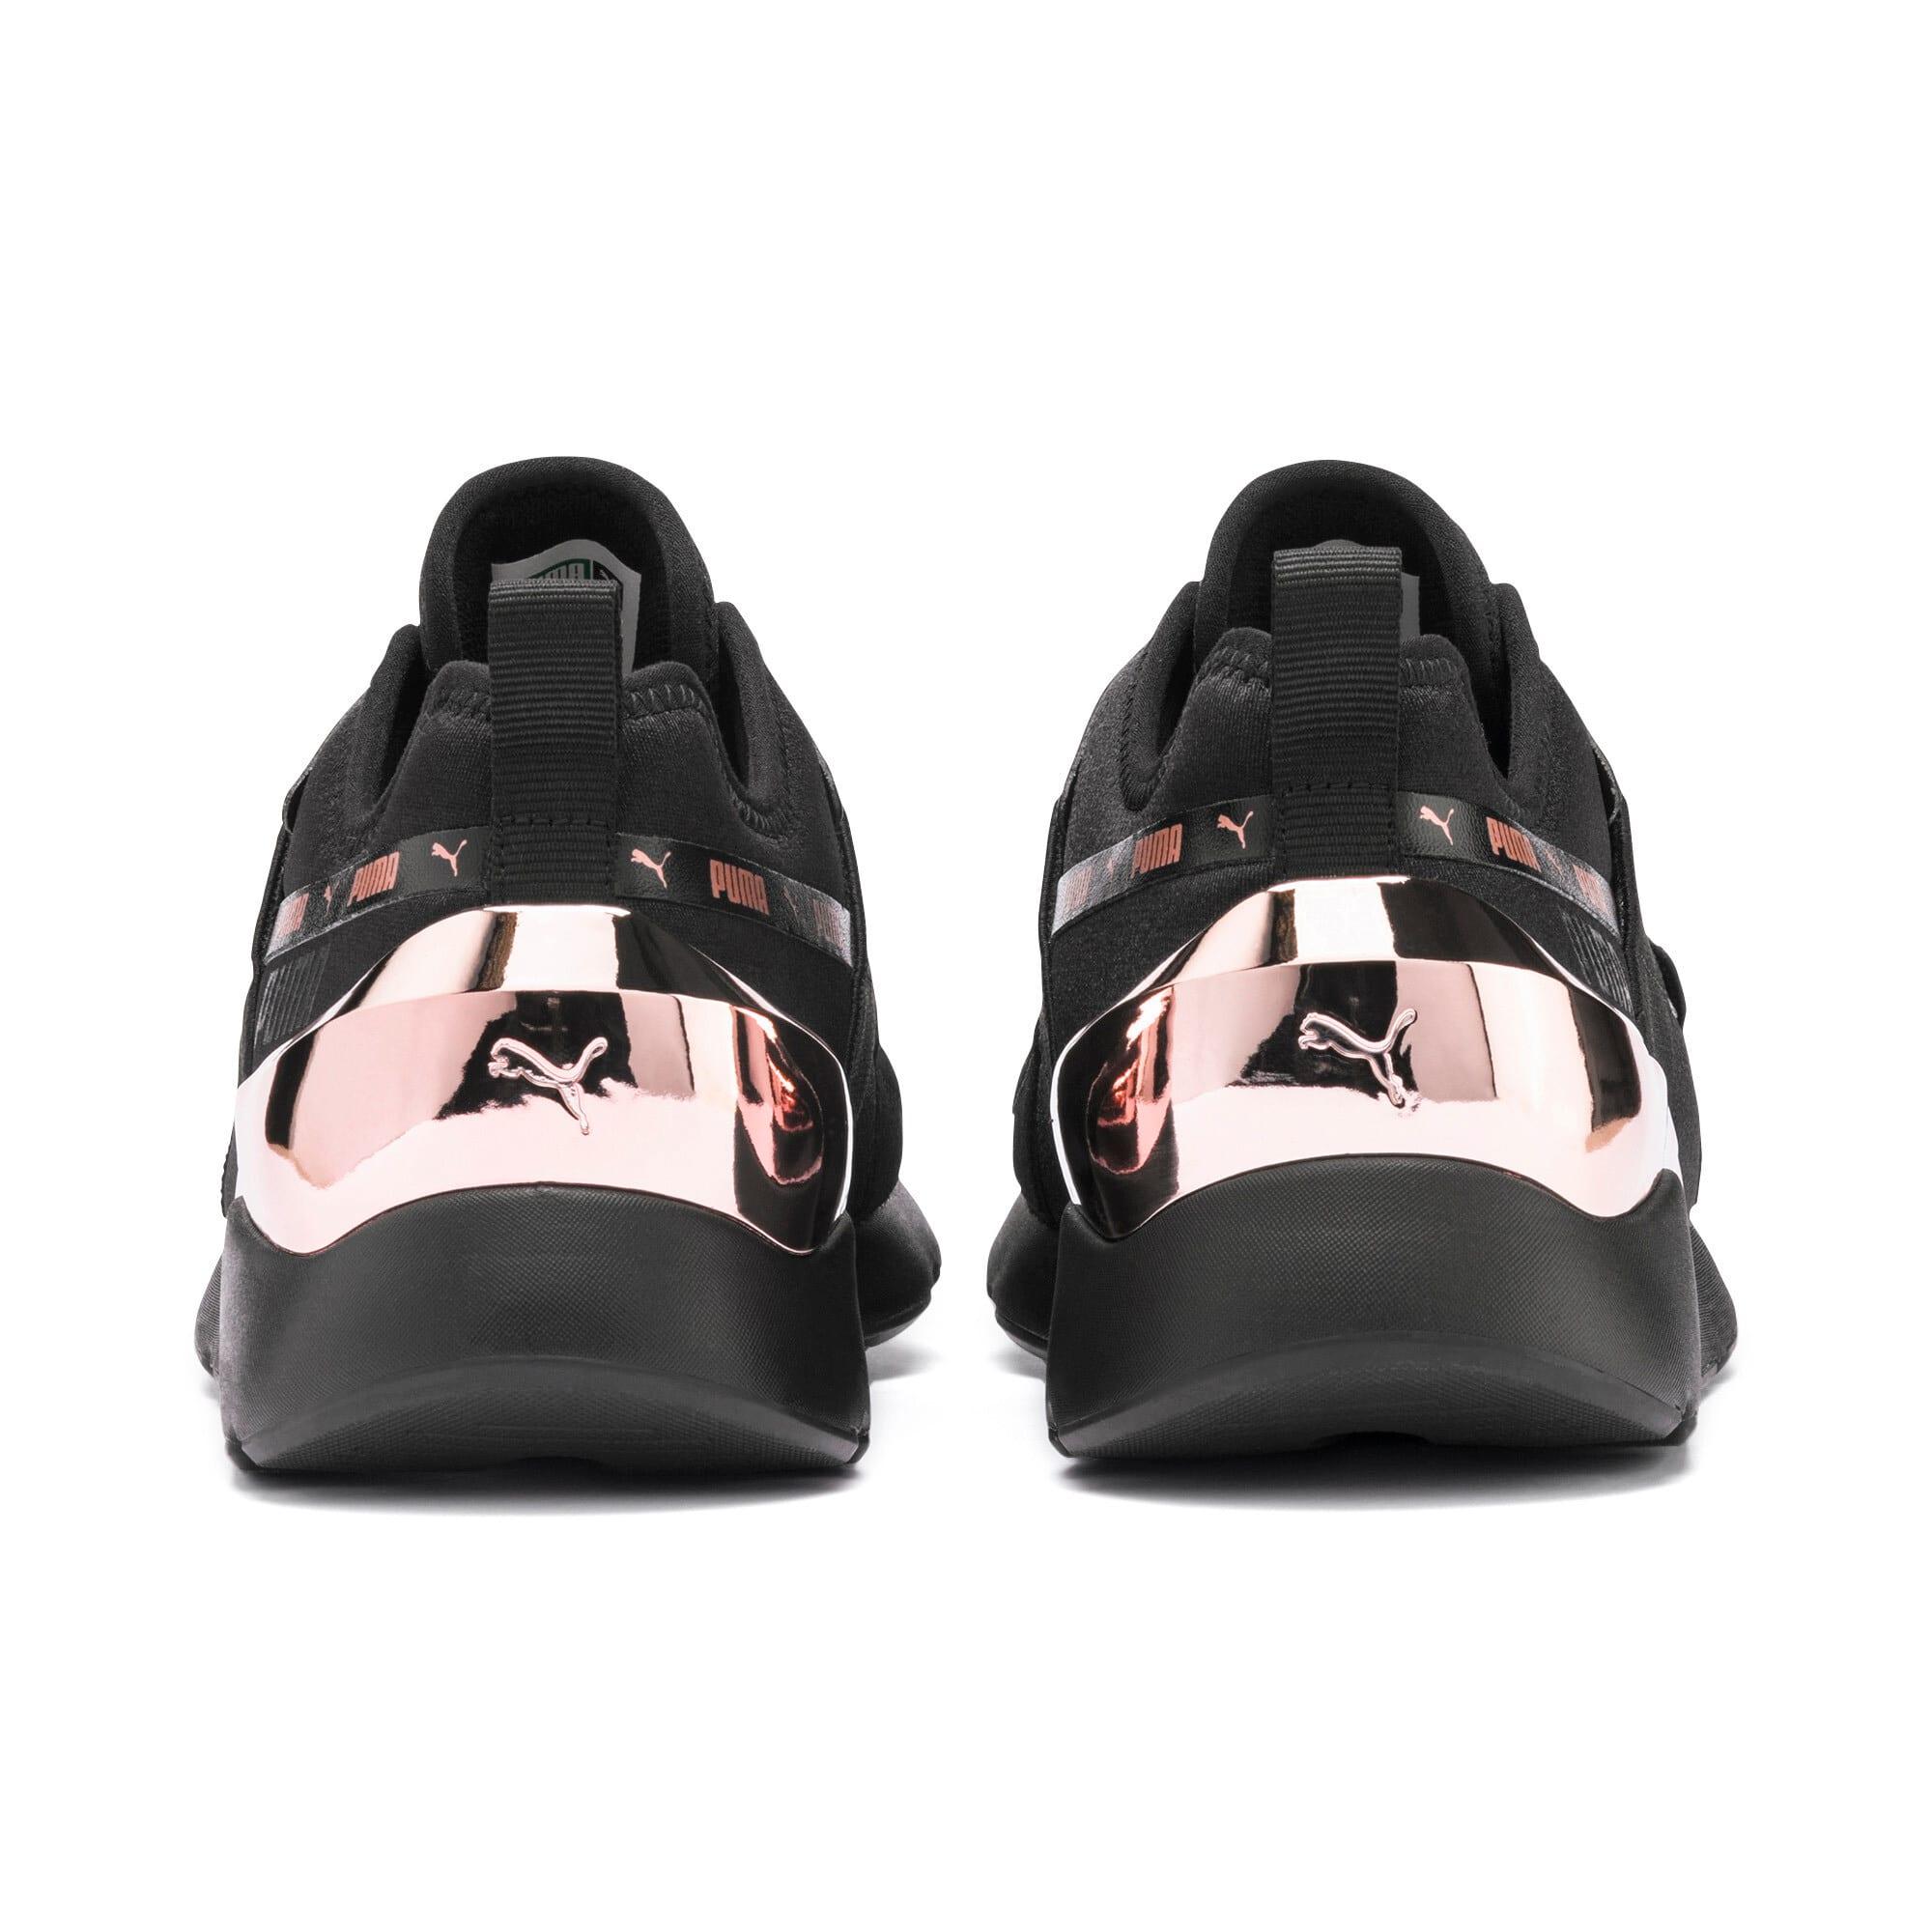 Thumbnail 4 of Muse X-2 Metallic Women's Sneakers, Puma Black-Rose Gold, medium